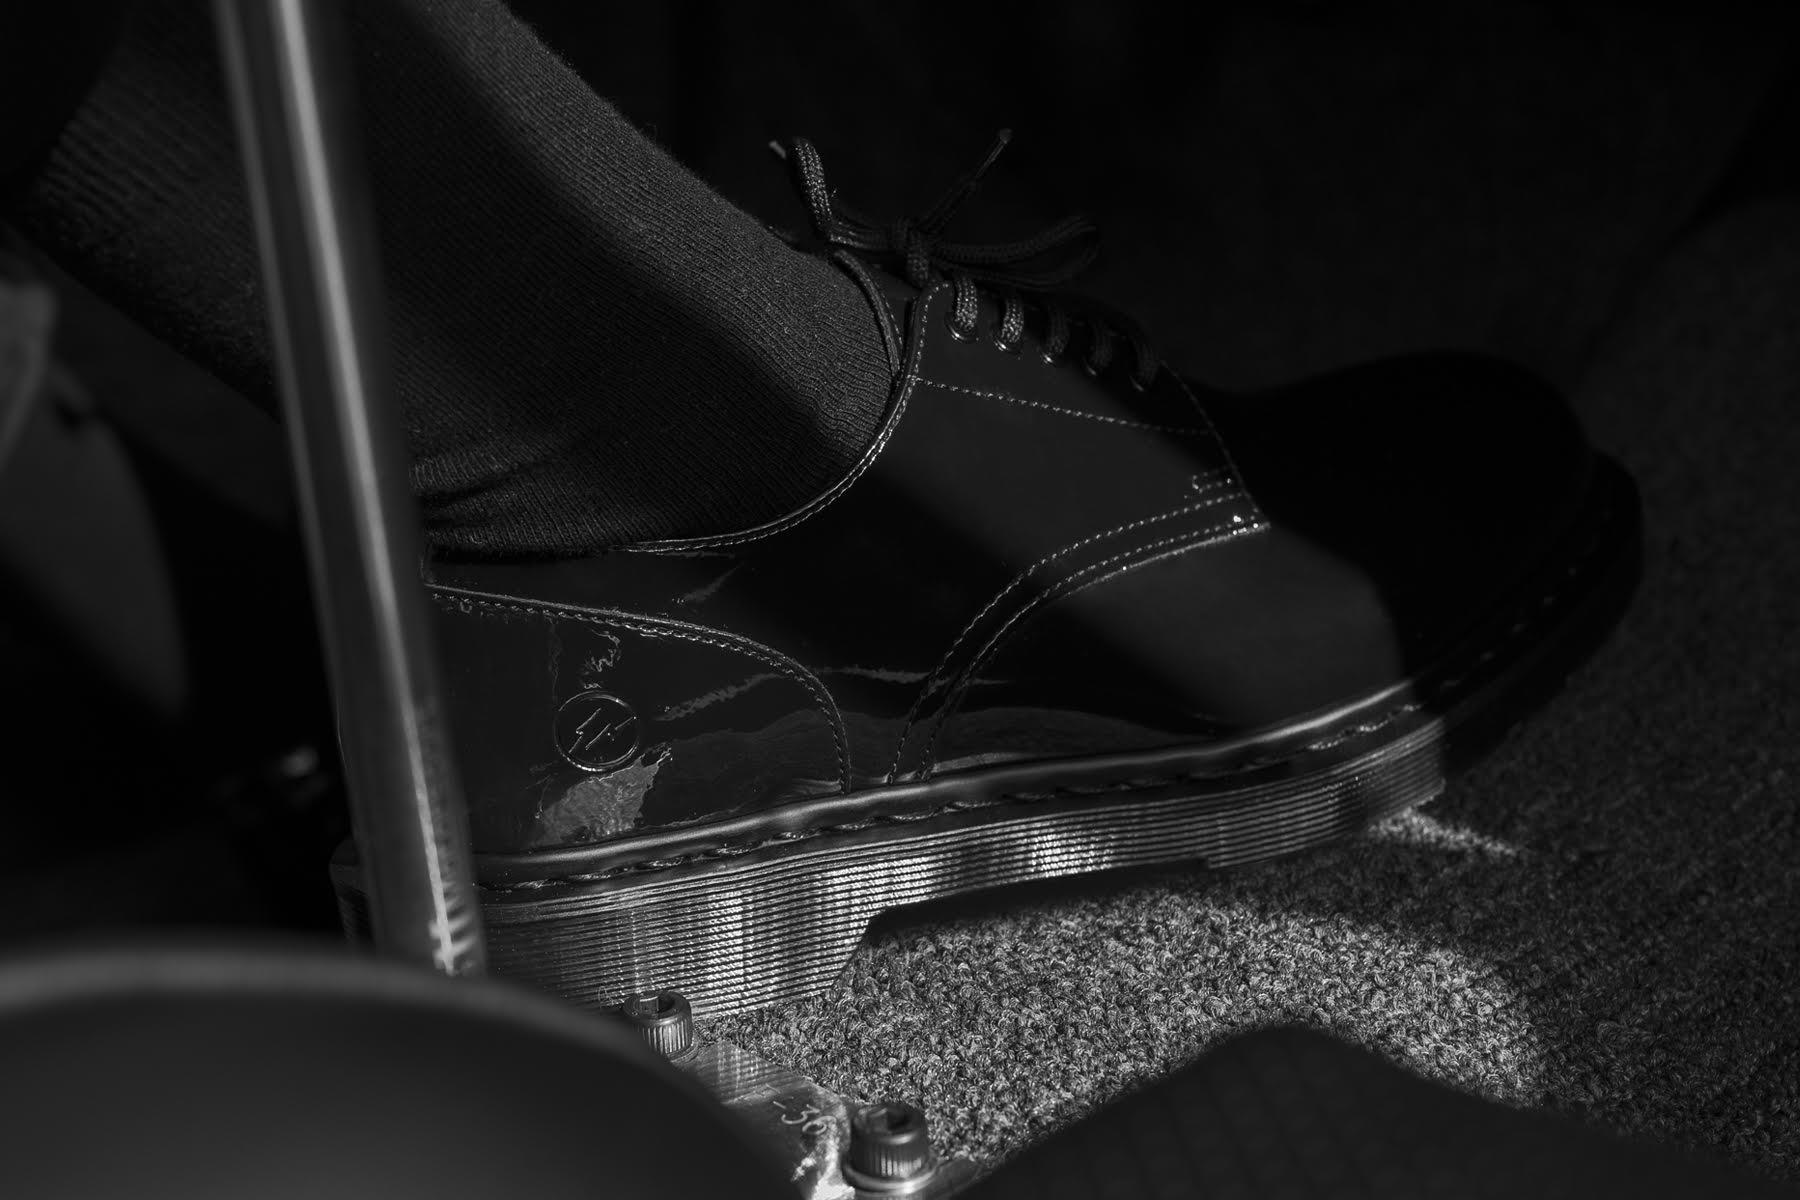 Blends 打造 fragment design x Dr. Martens 全新联名靴款造型特辑